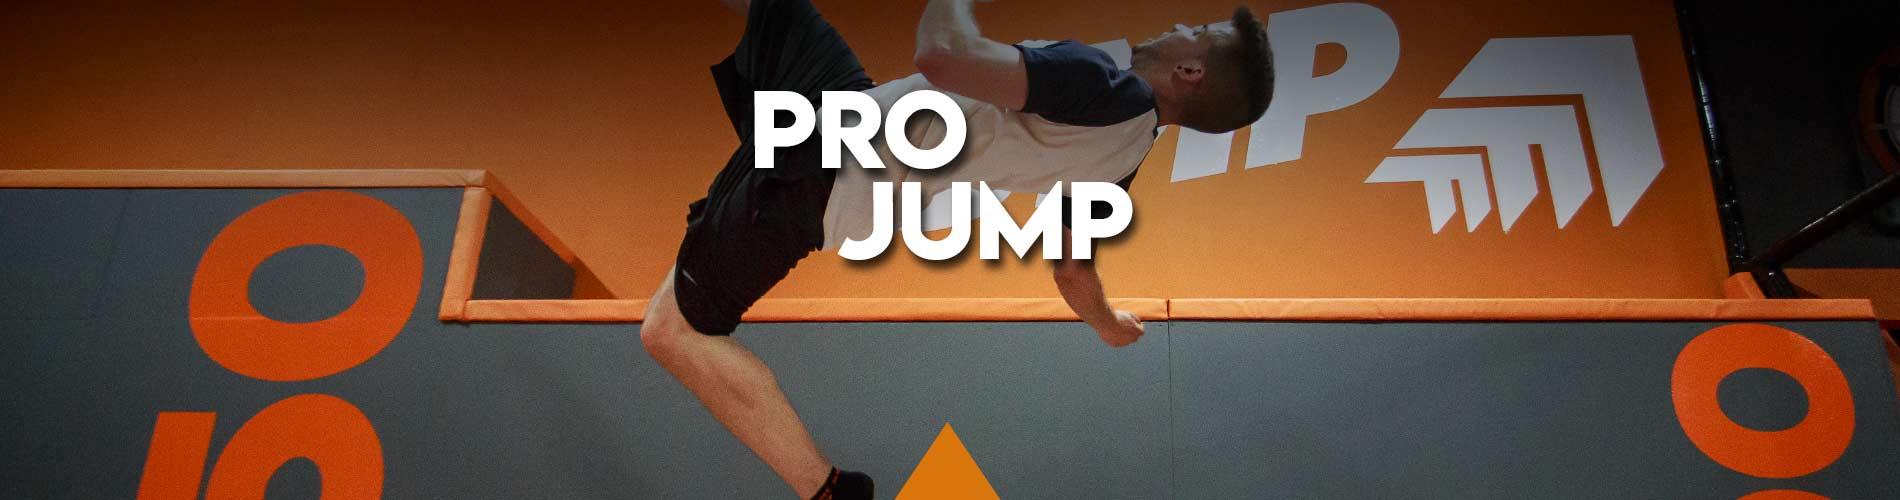 pro jump urban planet jump